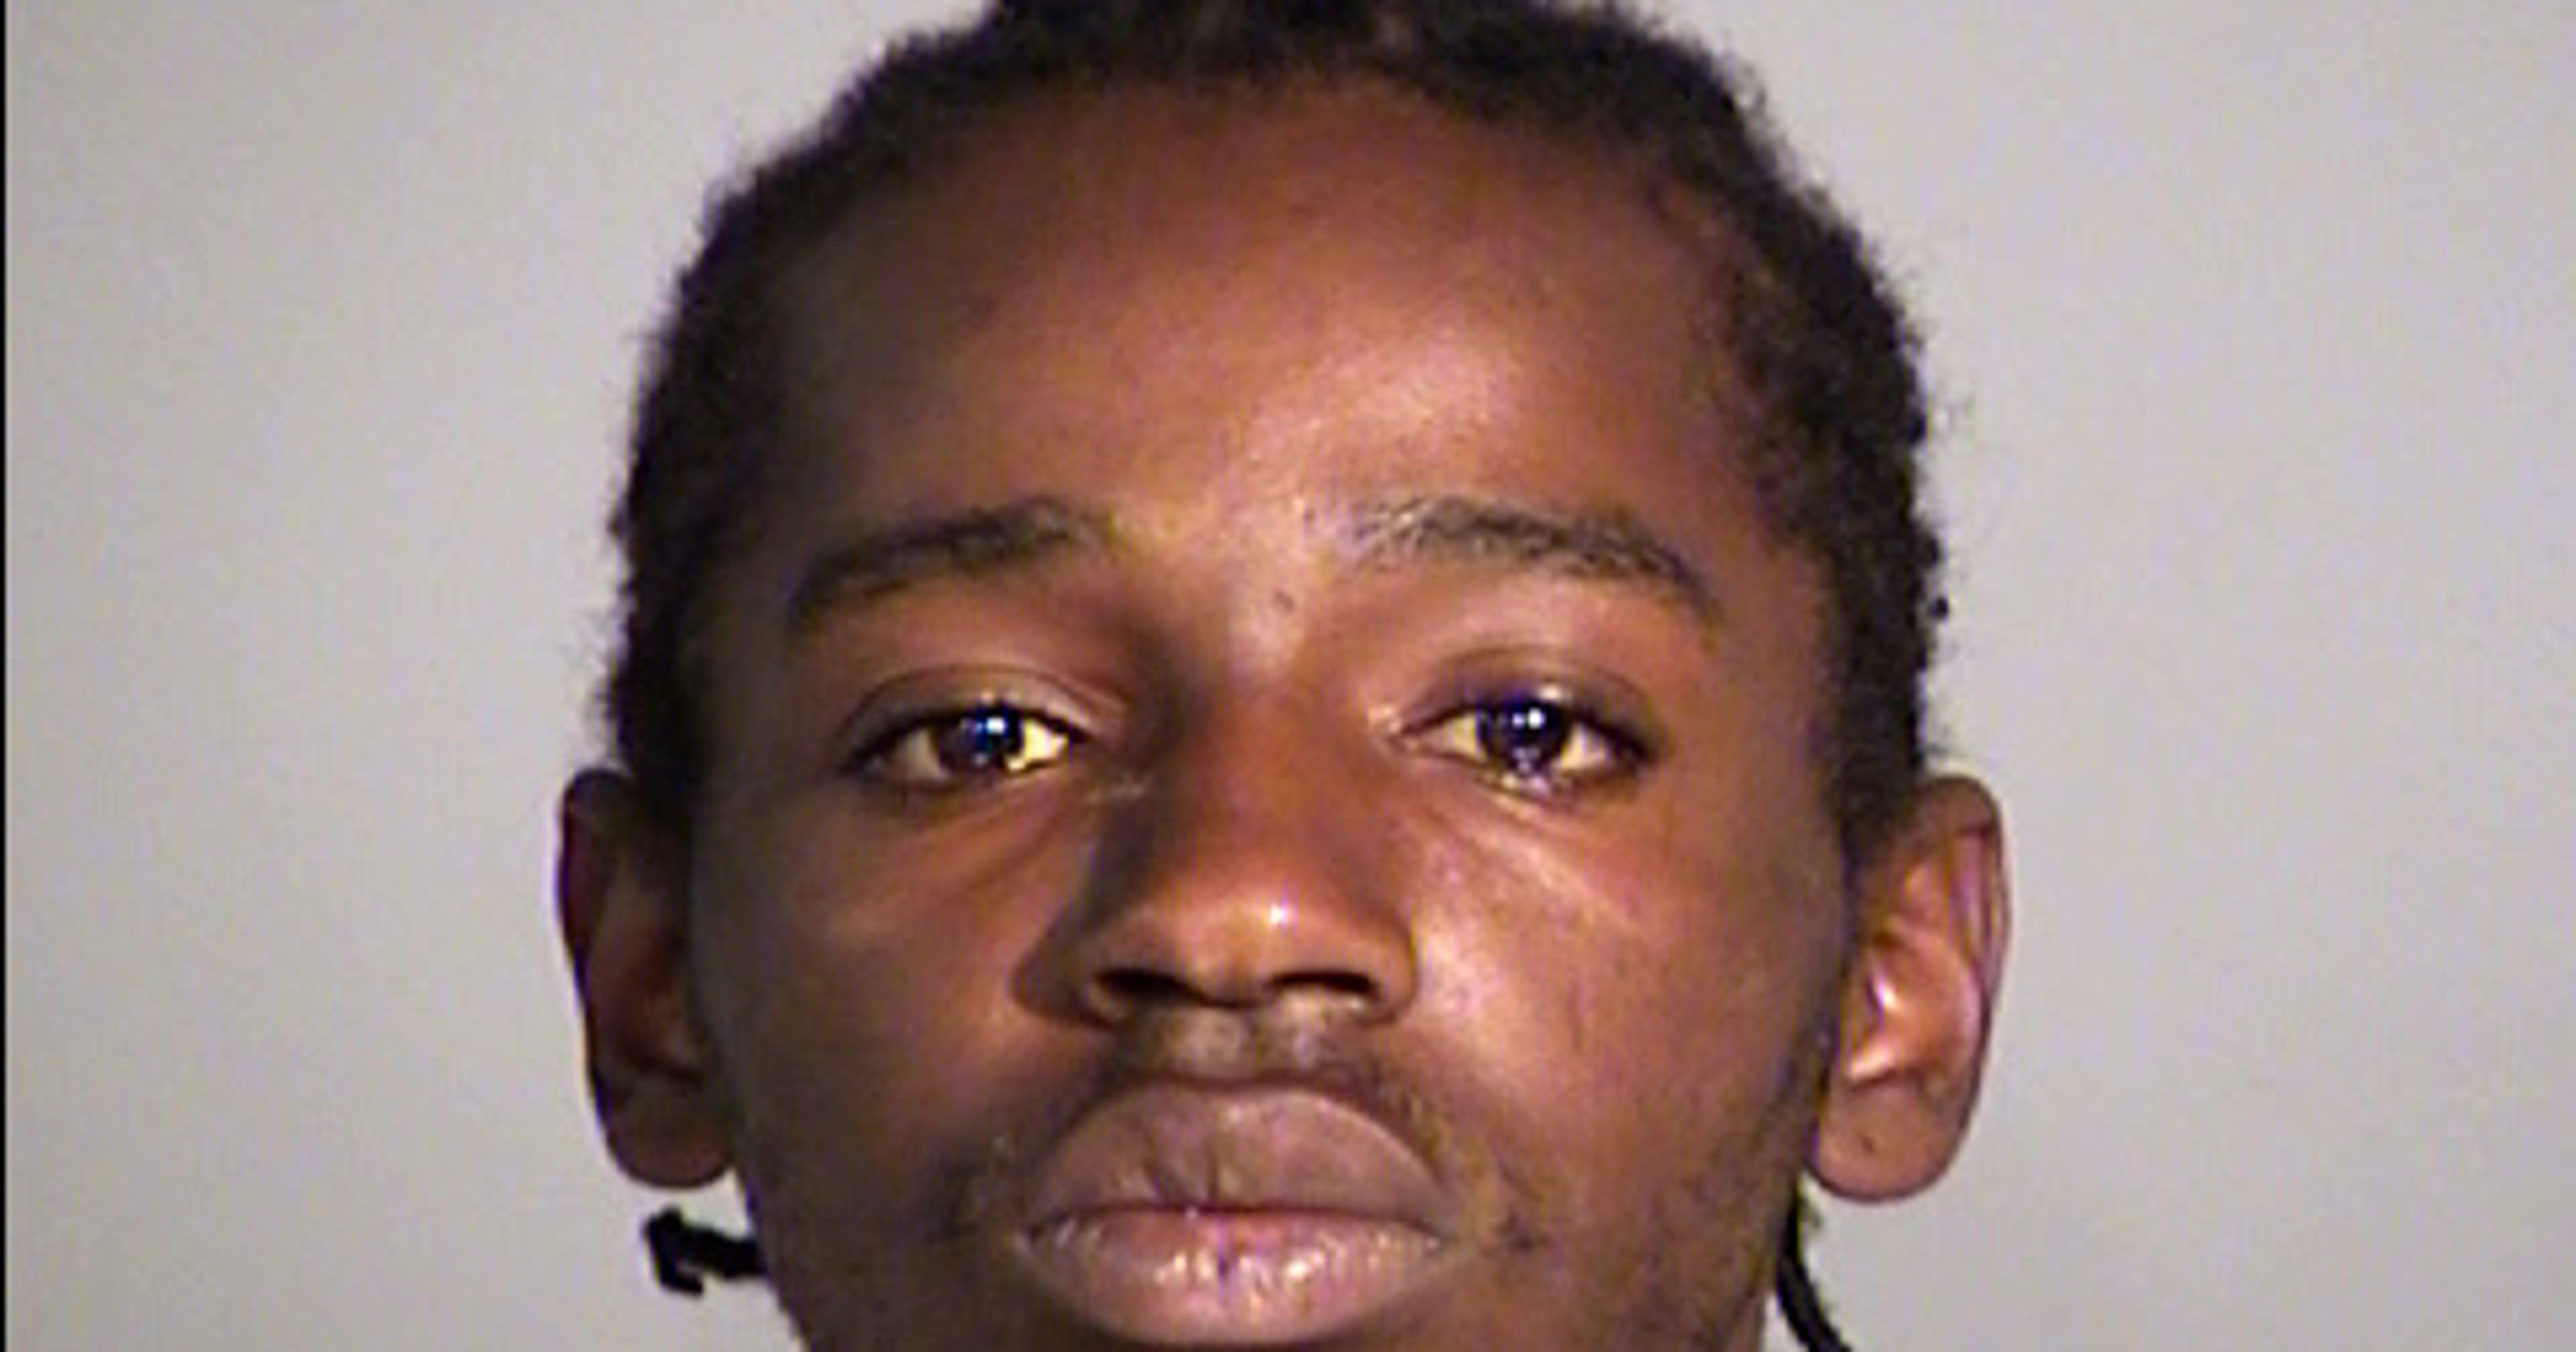 2 Arrested After Police Chase Head On Crash Injures Child